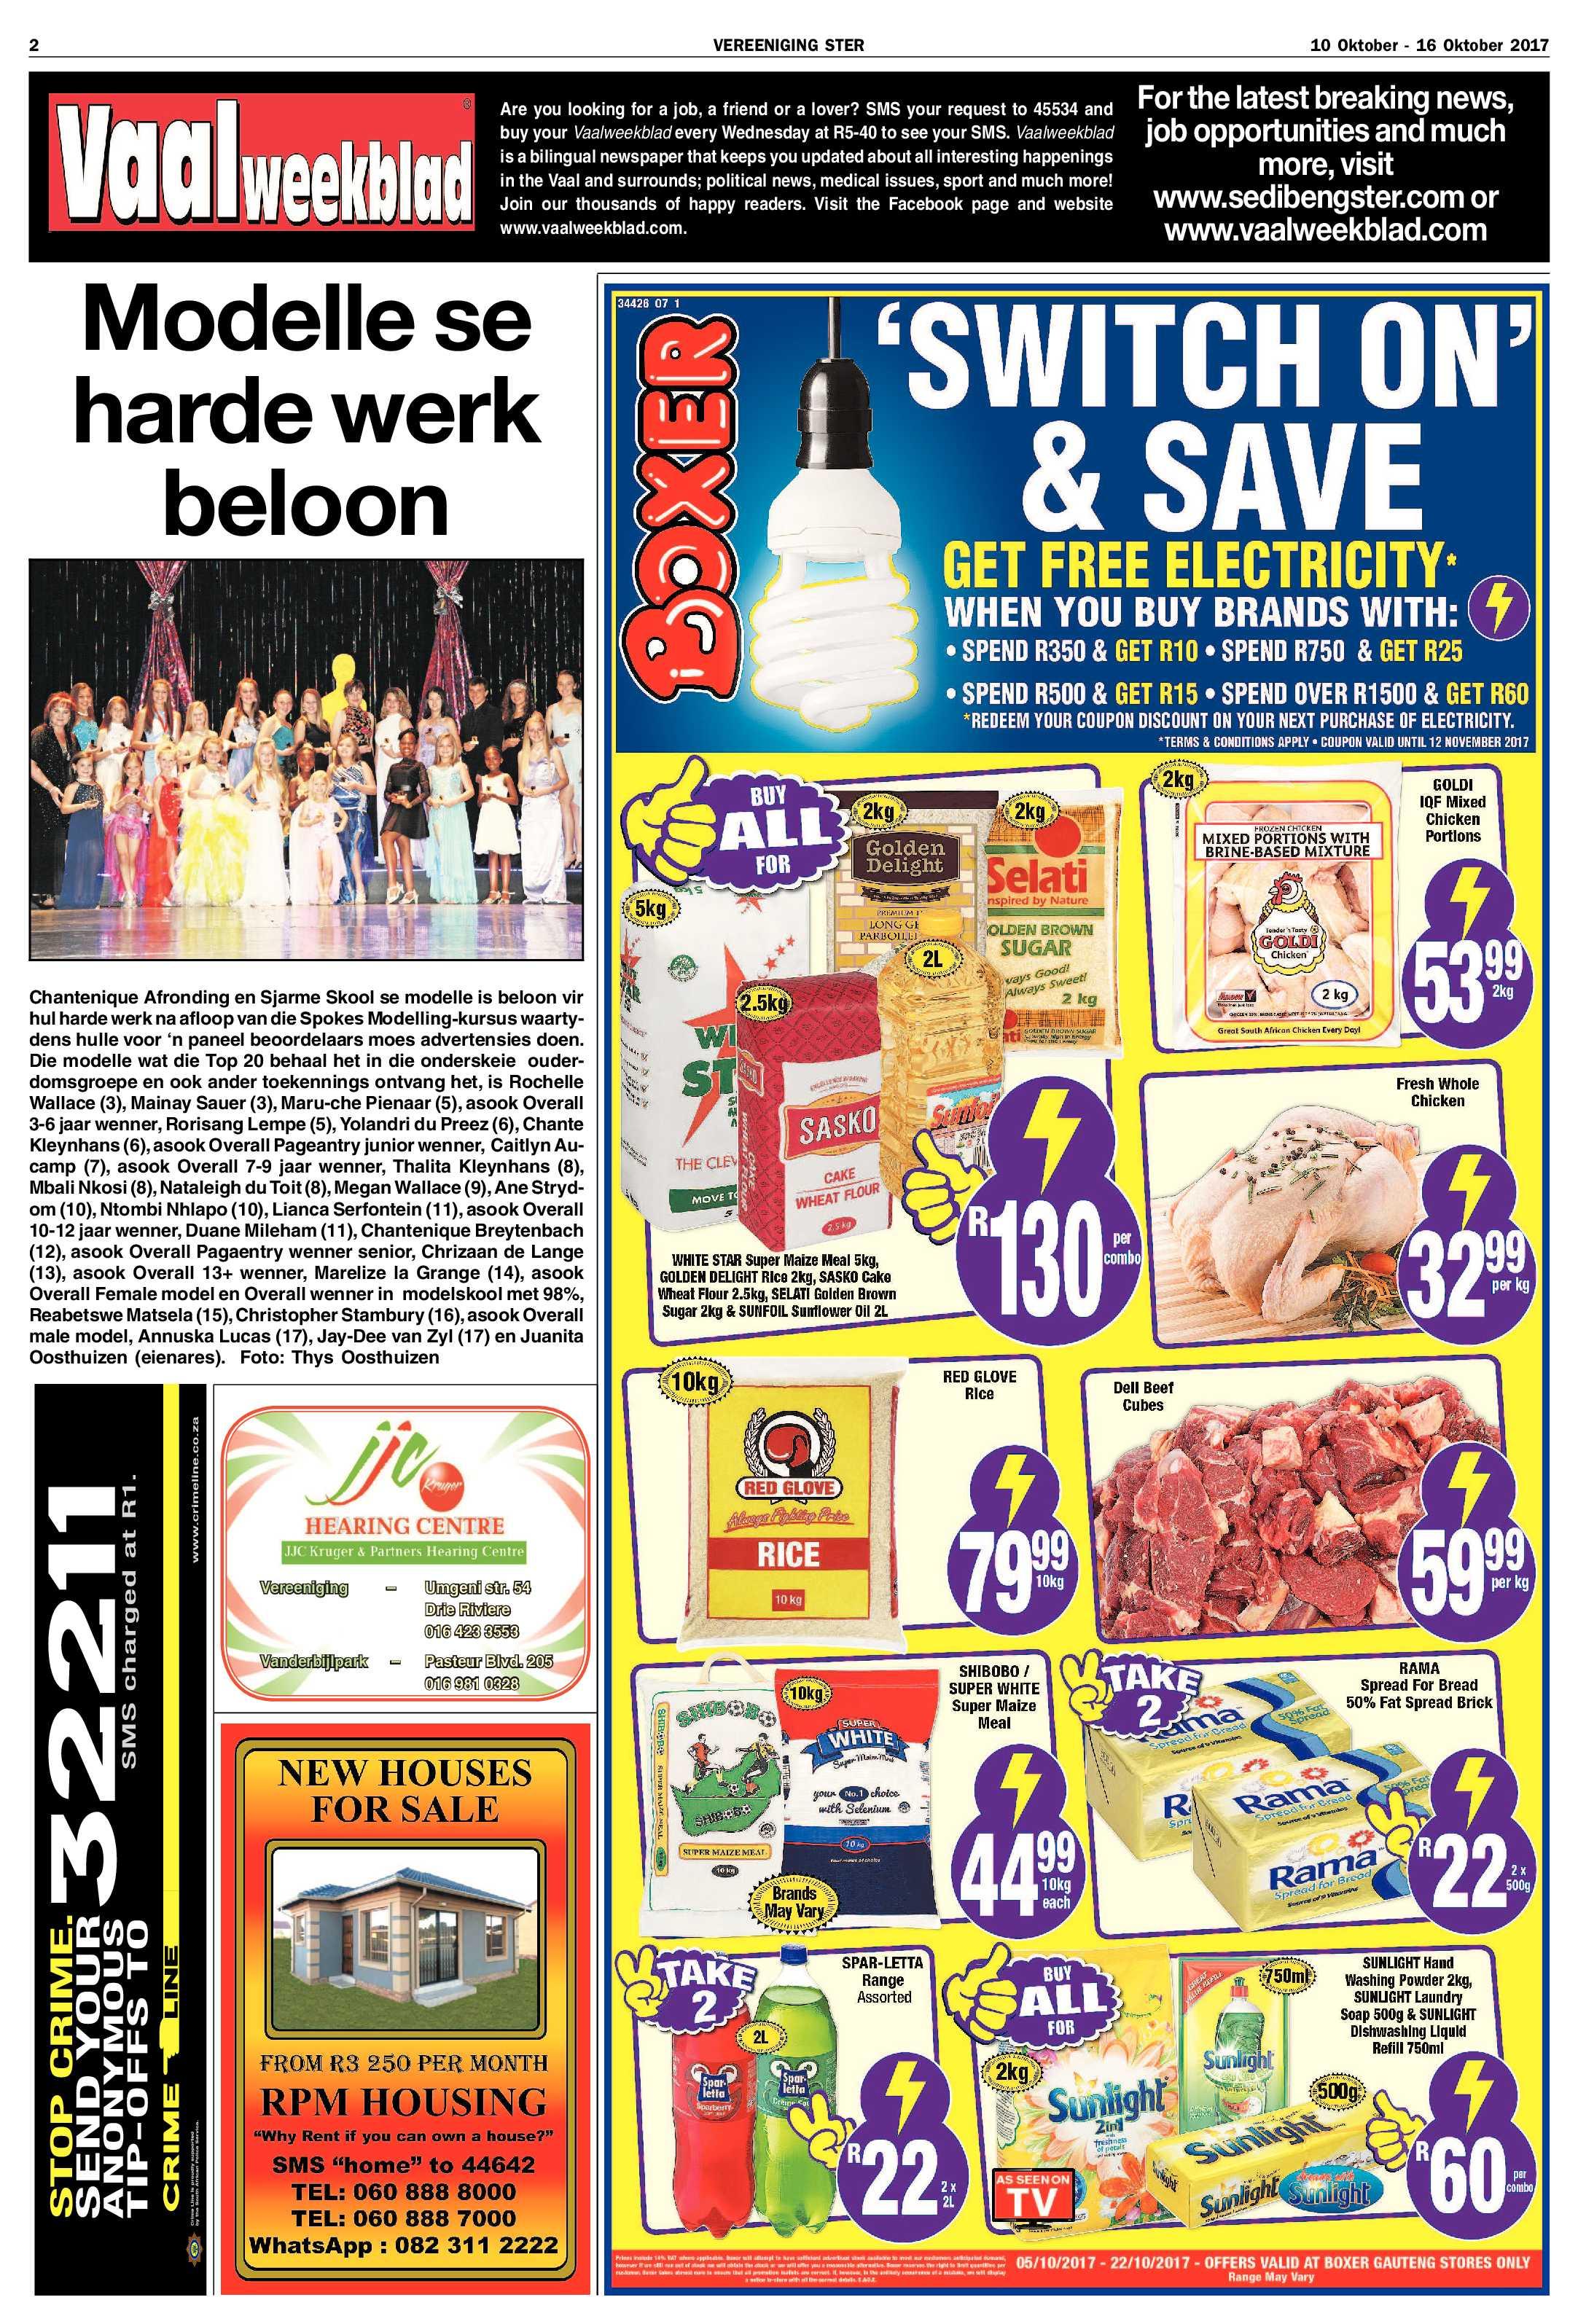 vereeniging-ster-10-16-oktober-2017-epapers-page-2